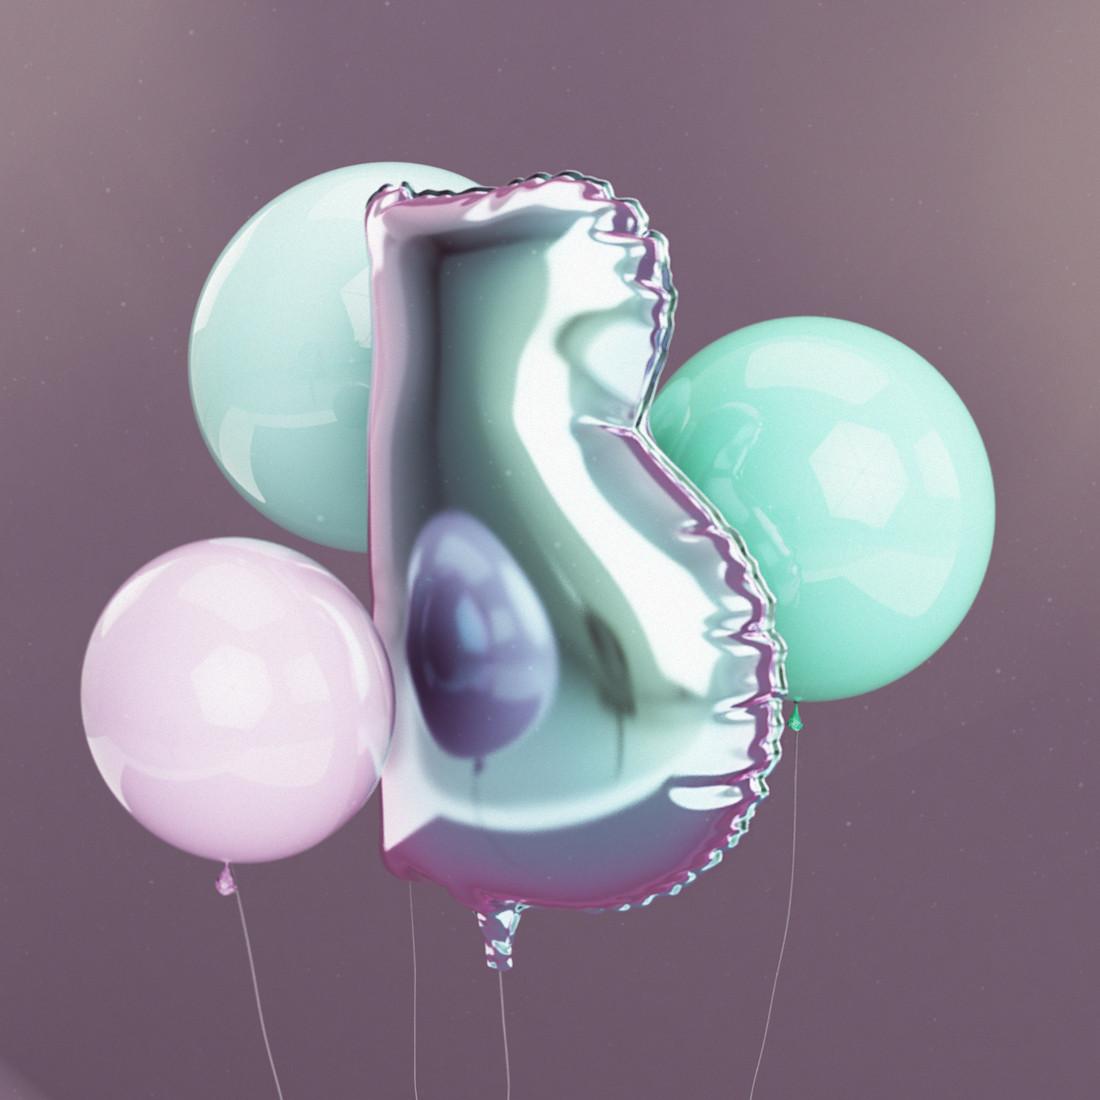 b_balloon_1100.jpg